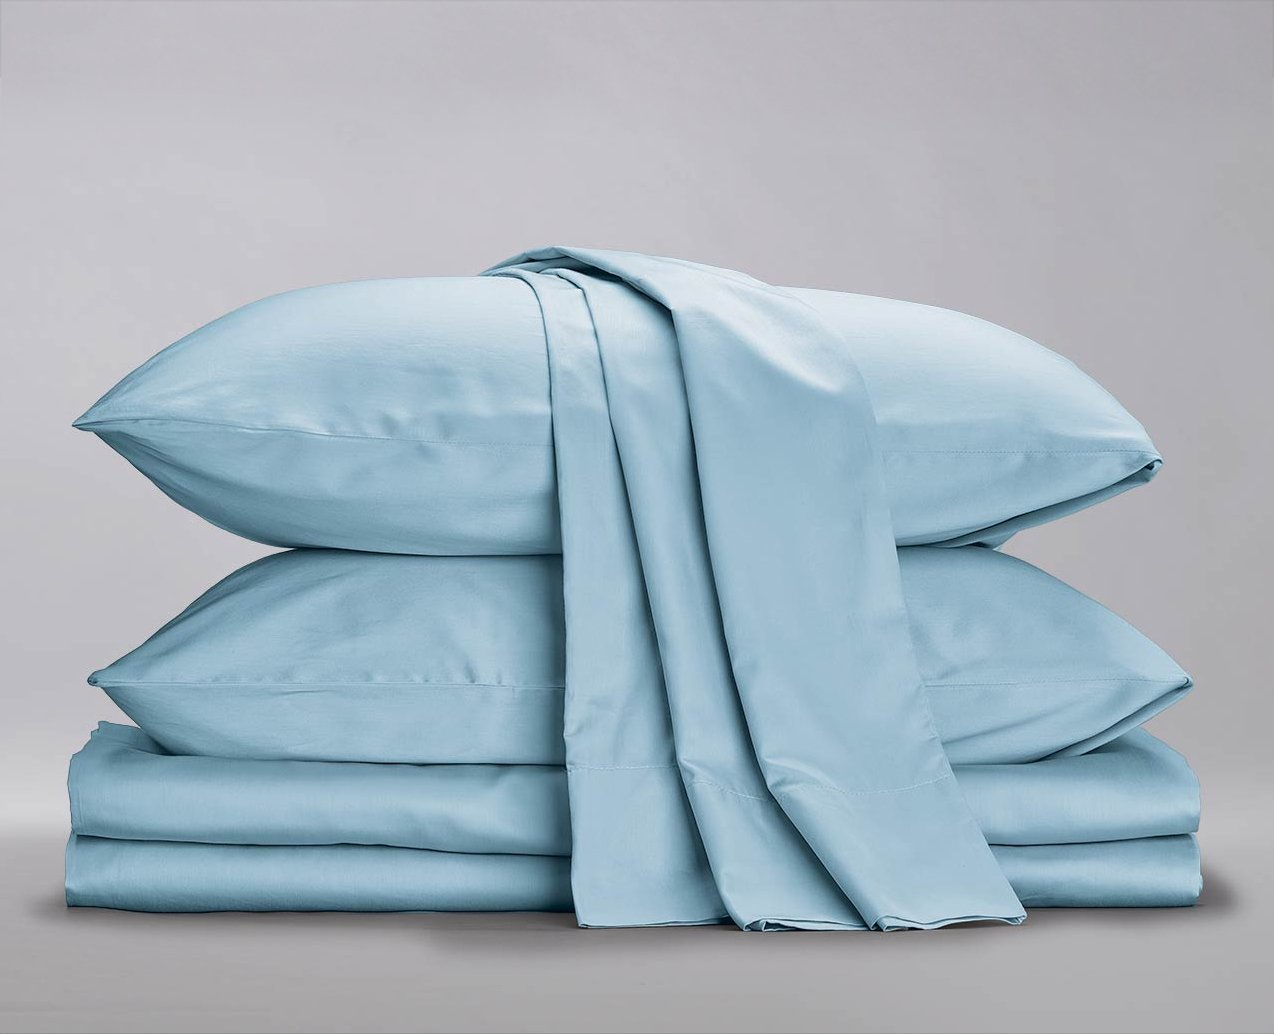 soft blue cotton bedding sol organics review